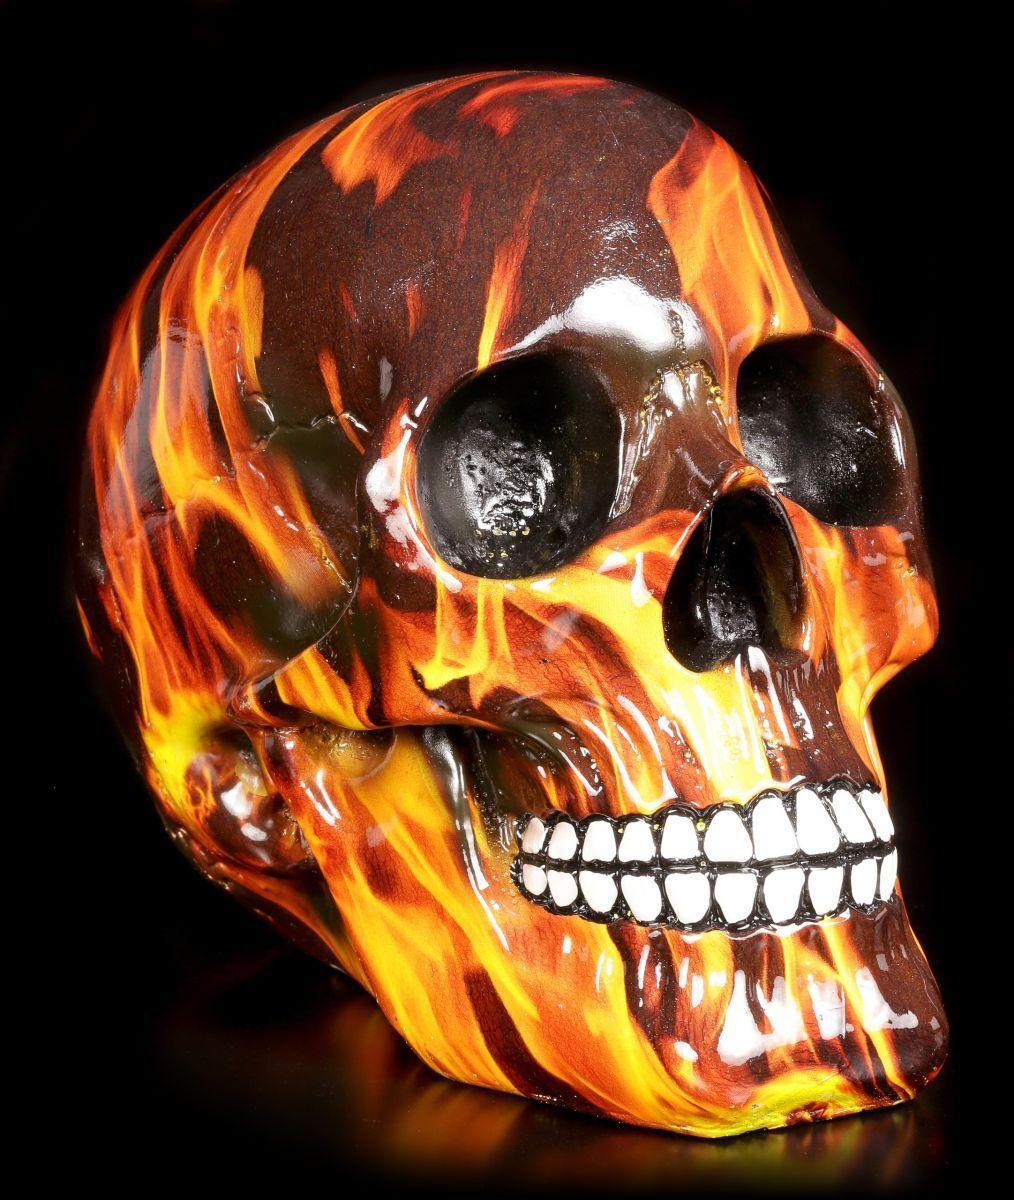 Bunter Totenkopf Mit Flammen - Inferno - Figur Feuer Schädel Skull